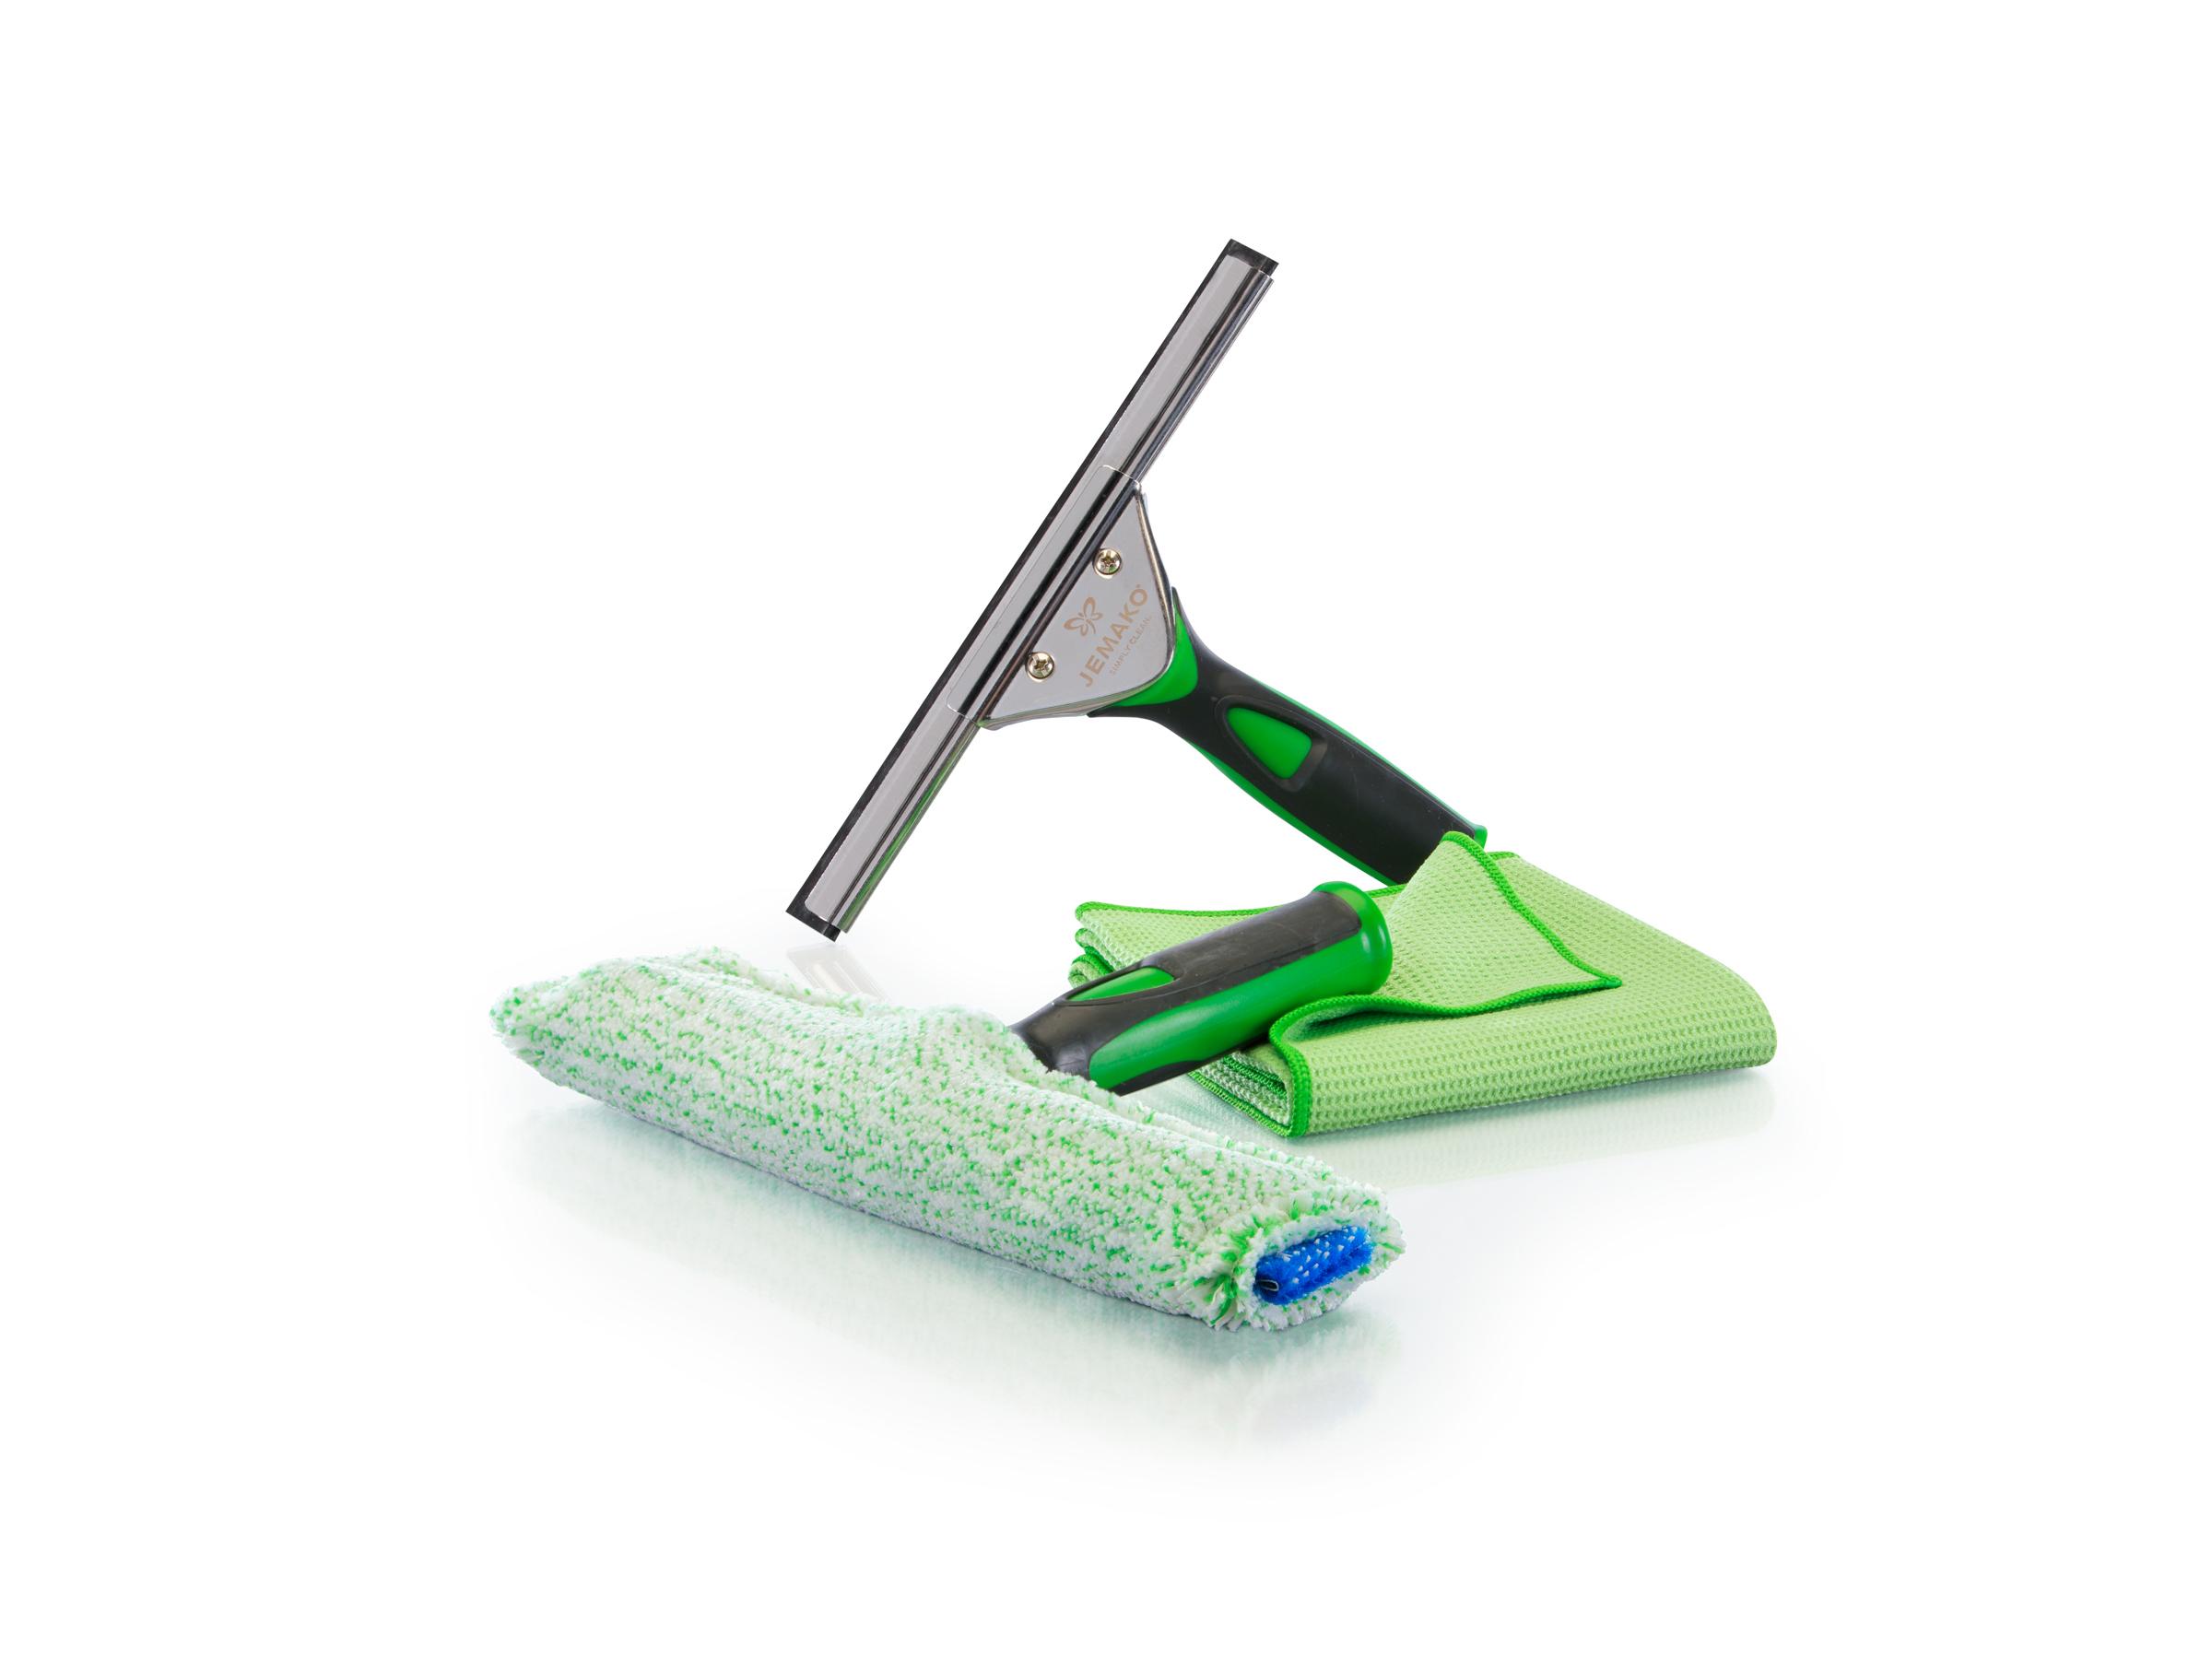 jemako fenster set profi 25 cm franzis putzwelt jemako produkte g nstig online kaufen. Black Bedroom Furniture Sets. Home Design Ideas